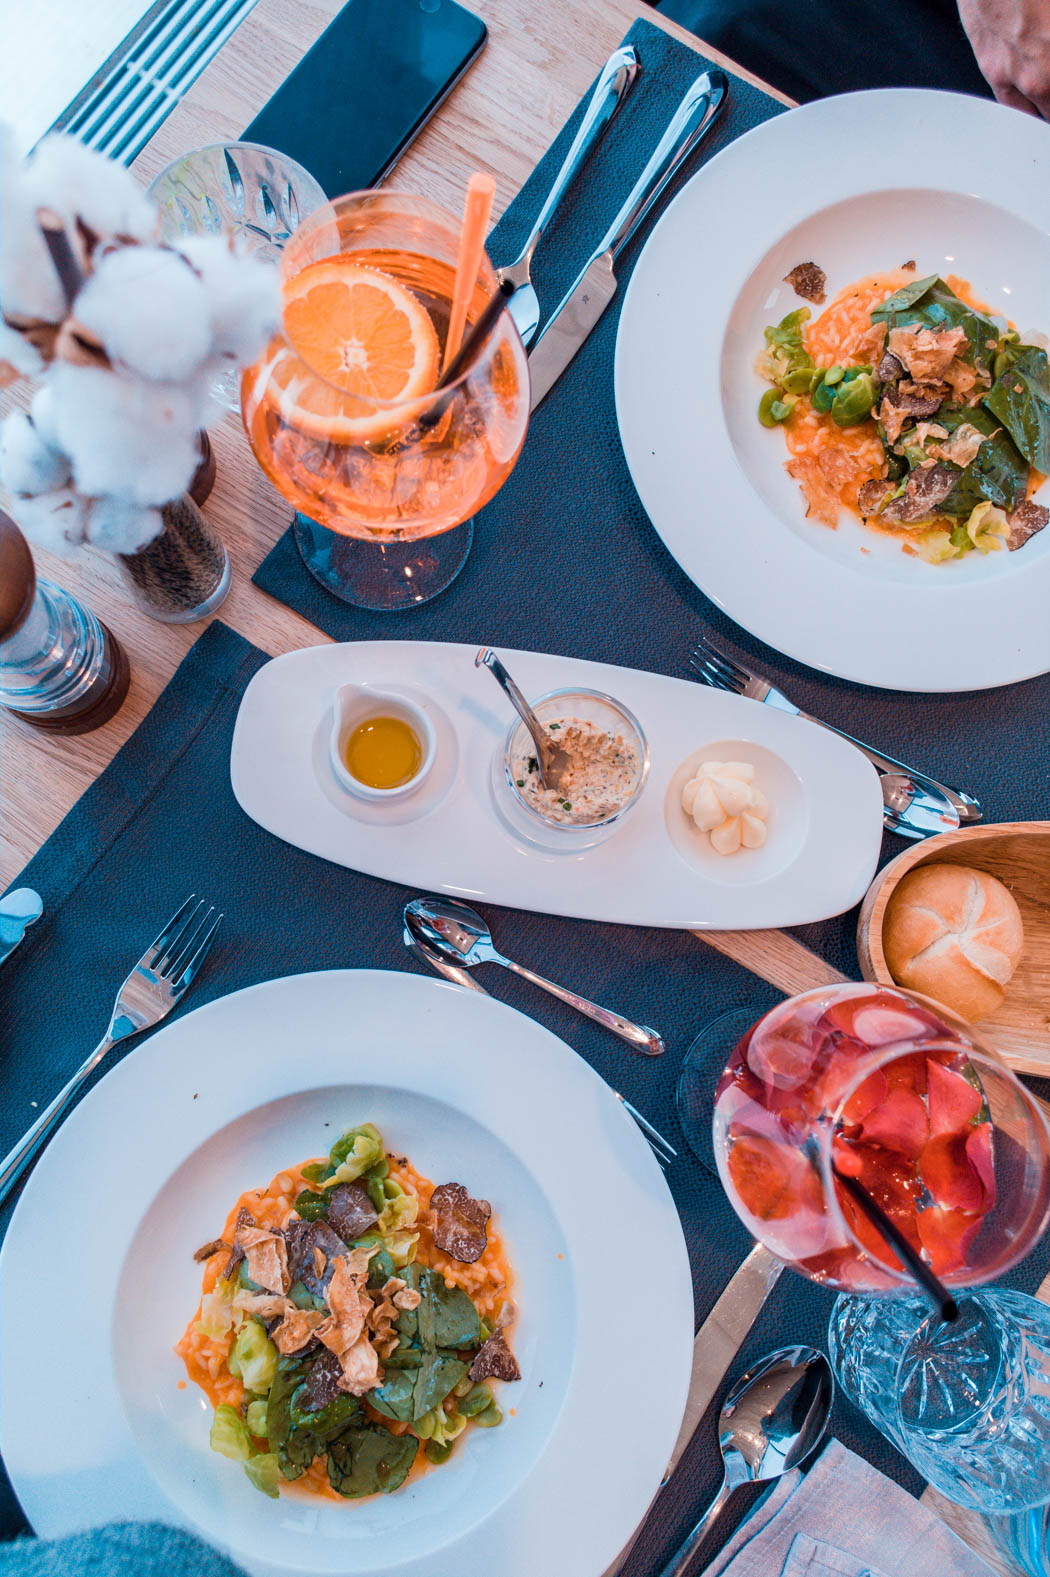 foodblog-foodblogger-food-blog-blogger-iceq-soelden-james-bond-location-berg-spectre-9